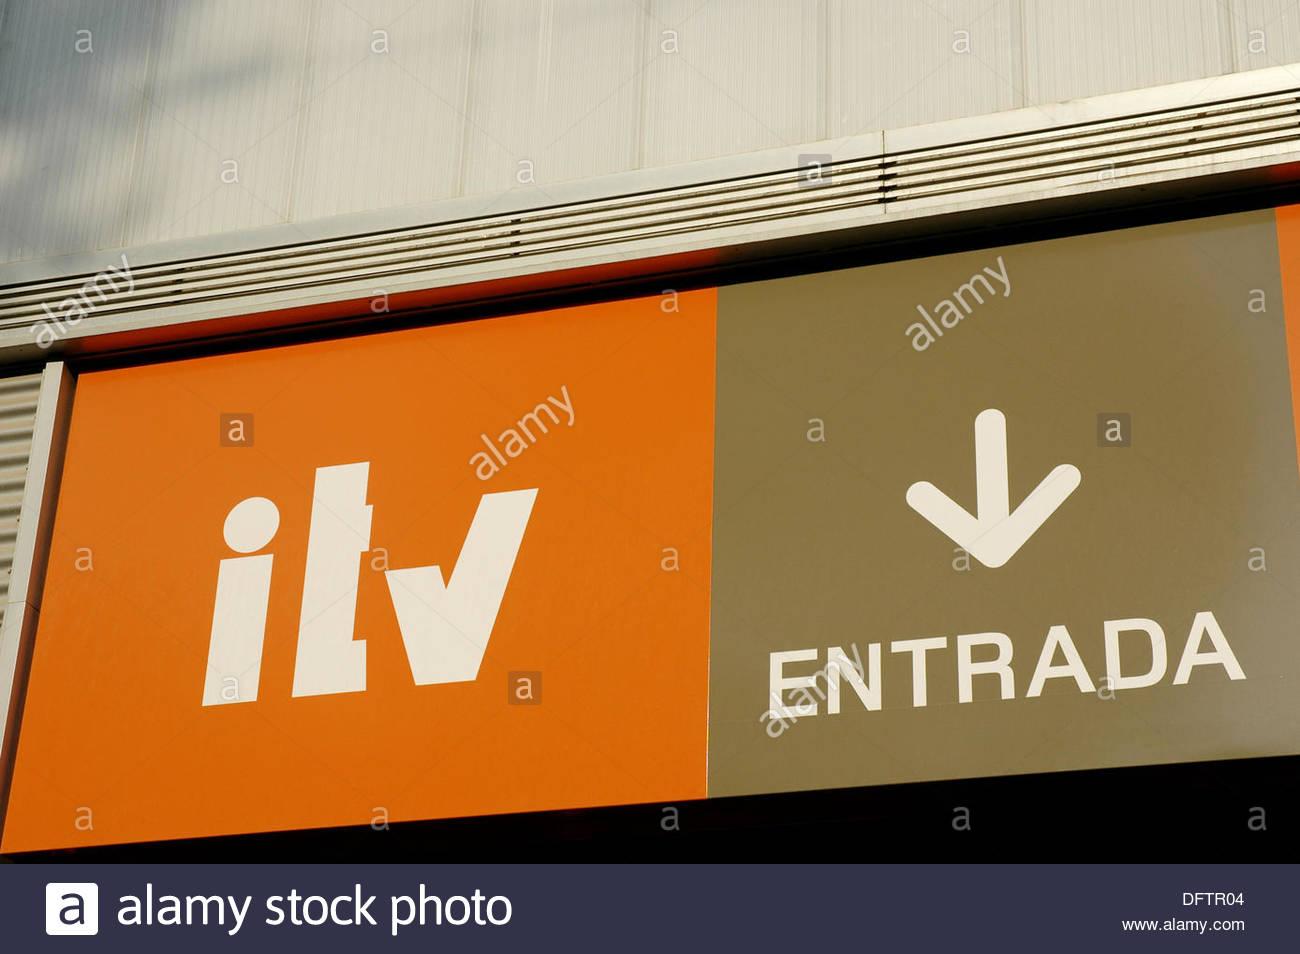 Itv Spanish Transport Test Certificate Entrance Stock Photo